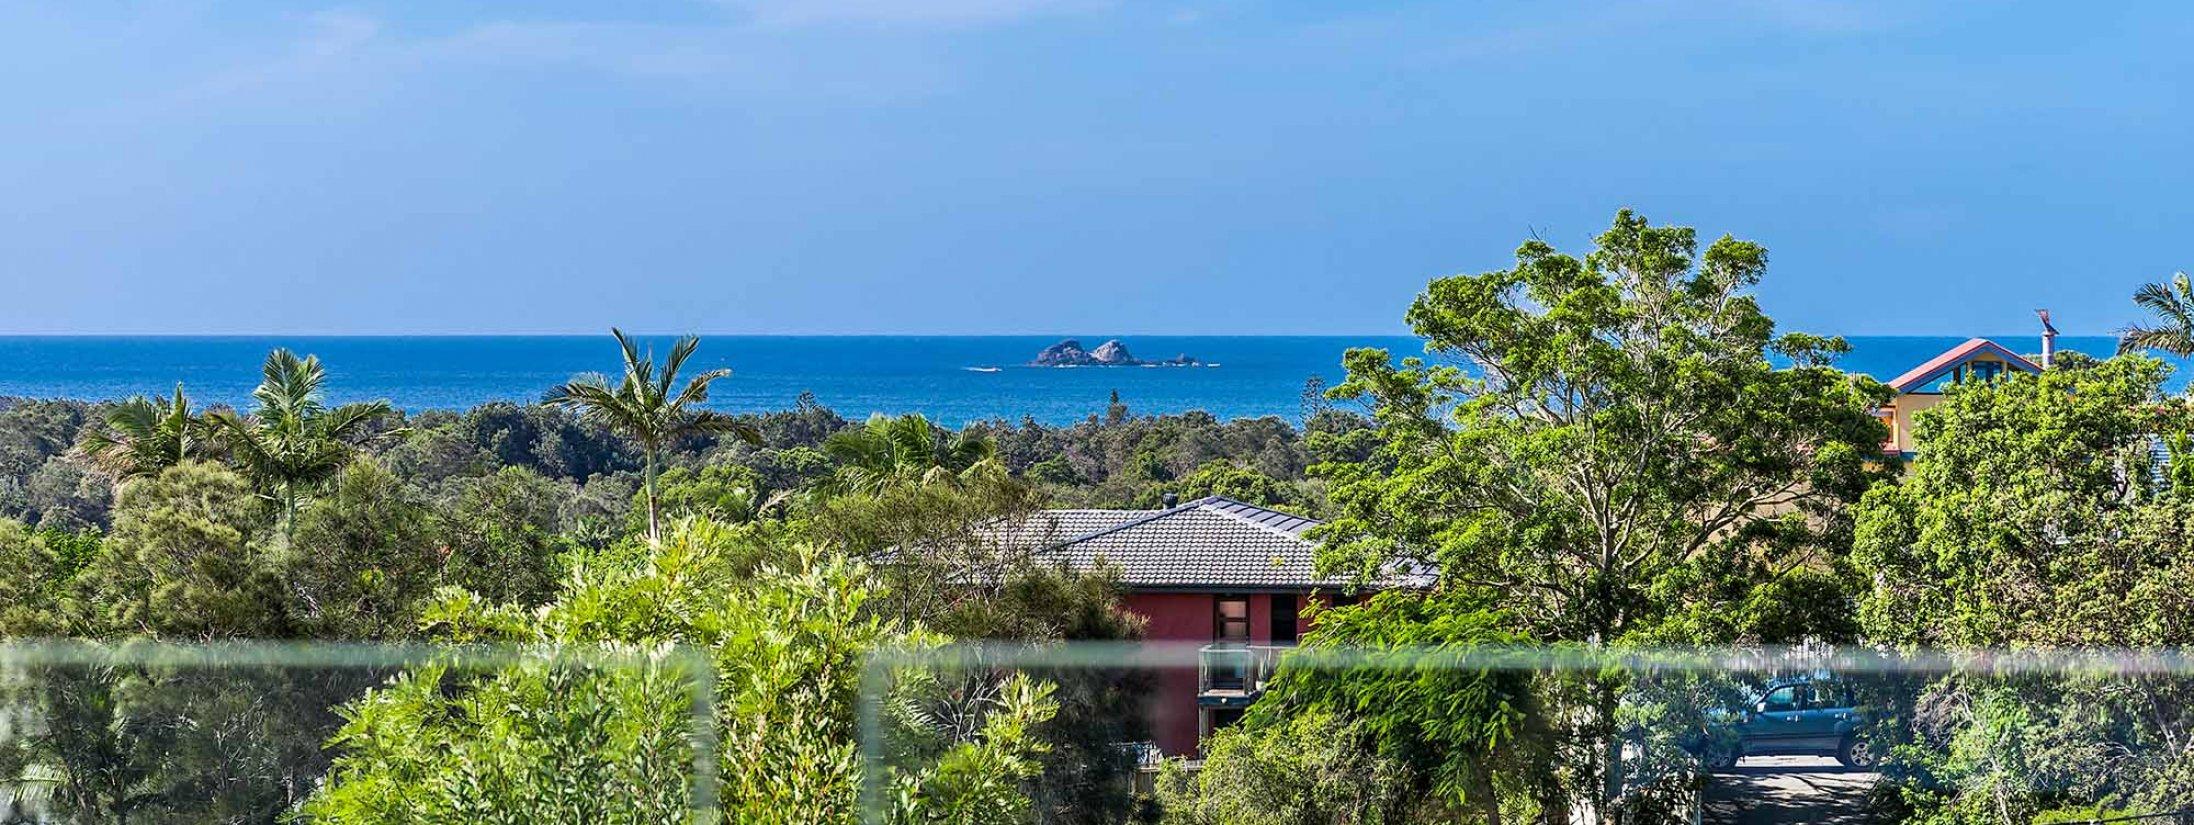 The Lookout - Byron Bay - View to Julian Rocks